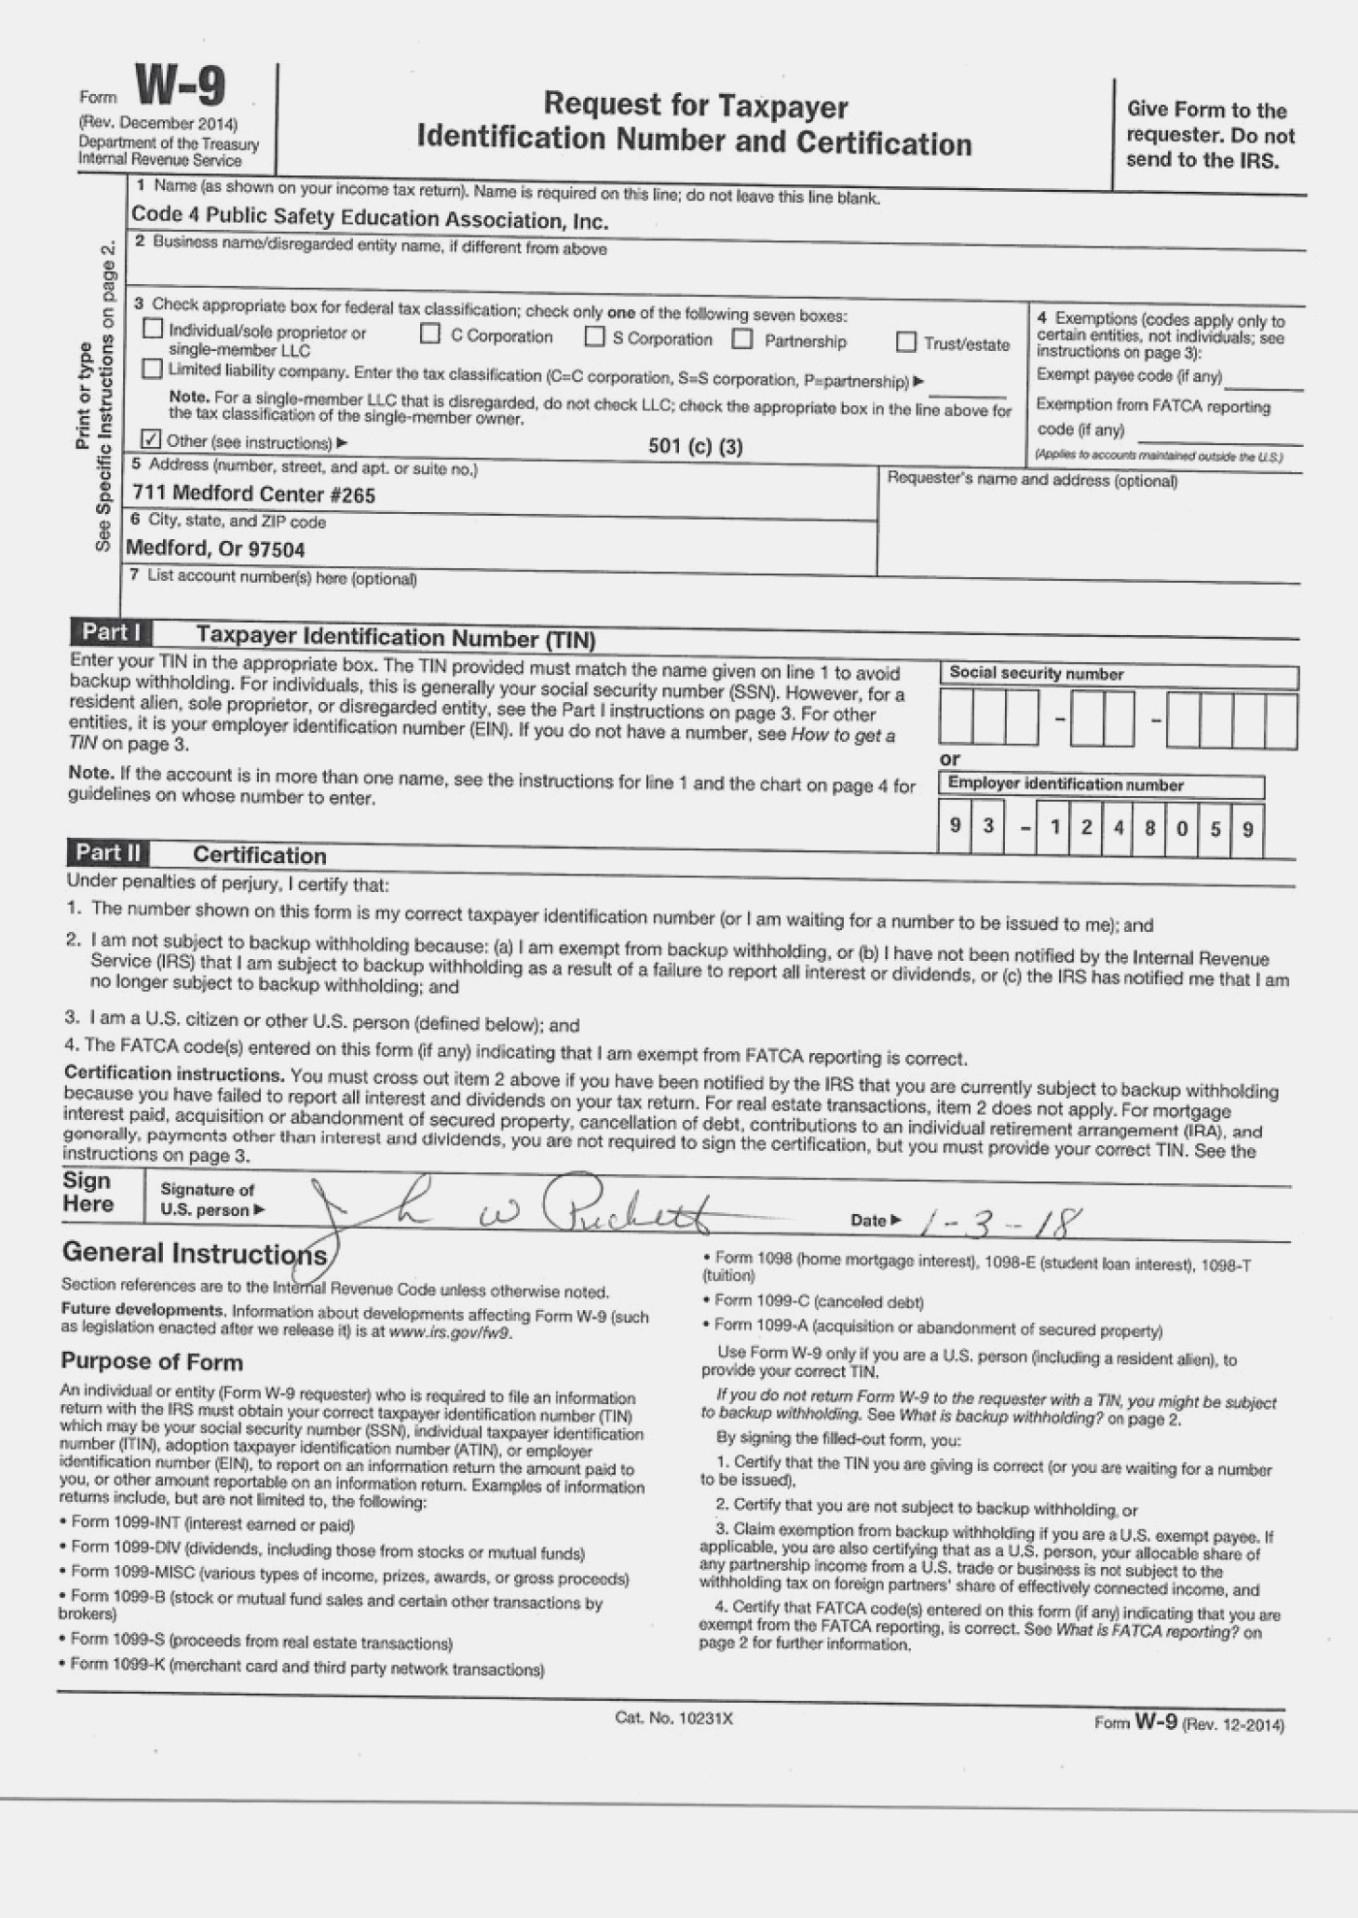 W9 Form Printable, Fillable, Blank 2019 & 2020 regarding Irs W-9 Printable Form